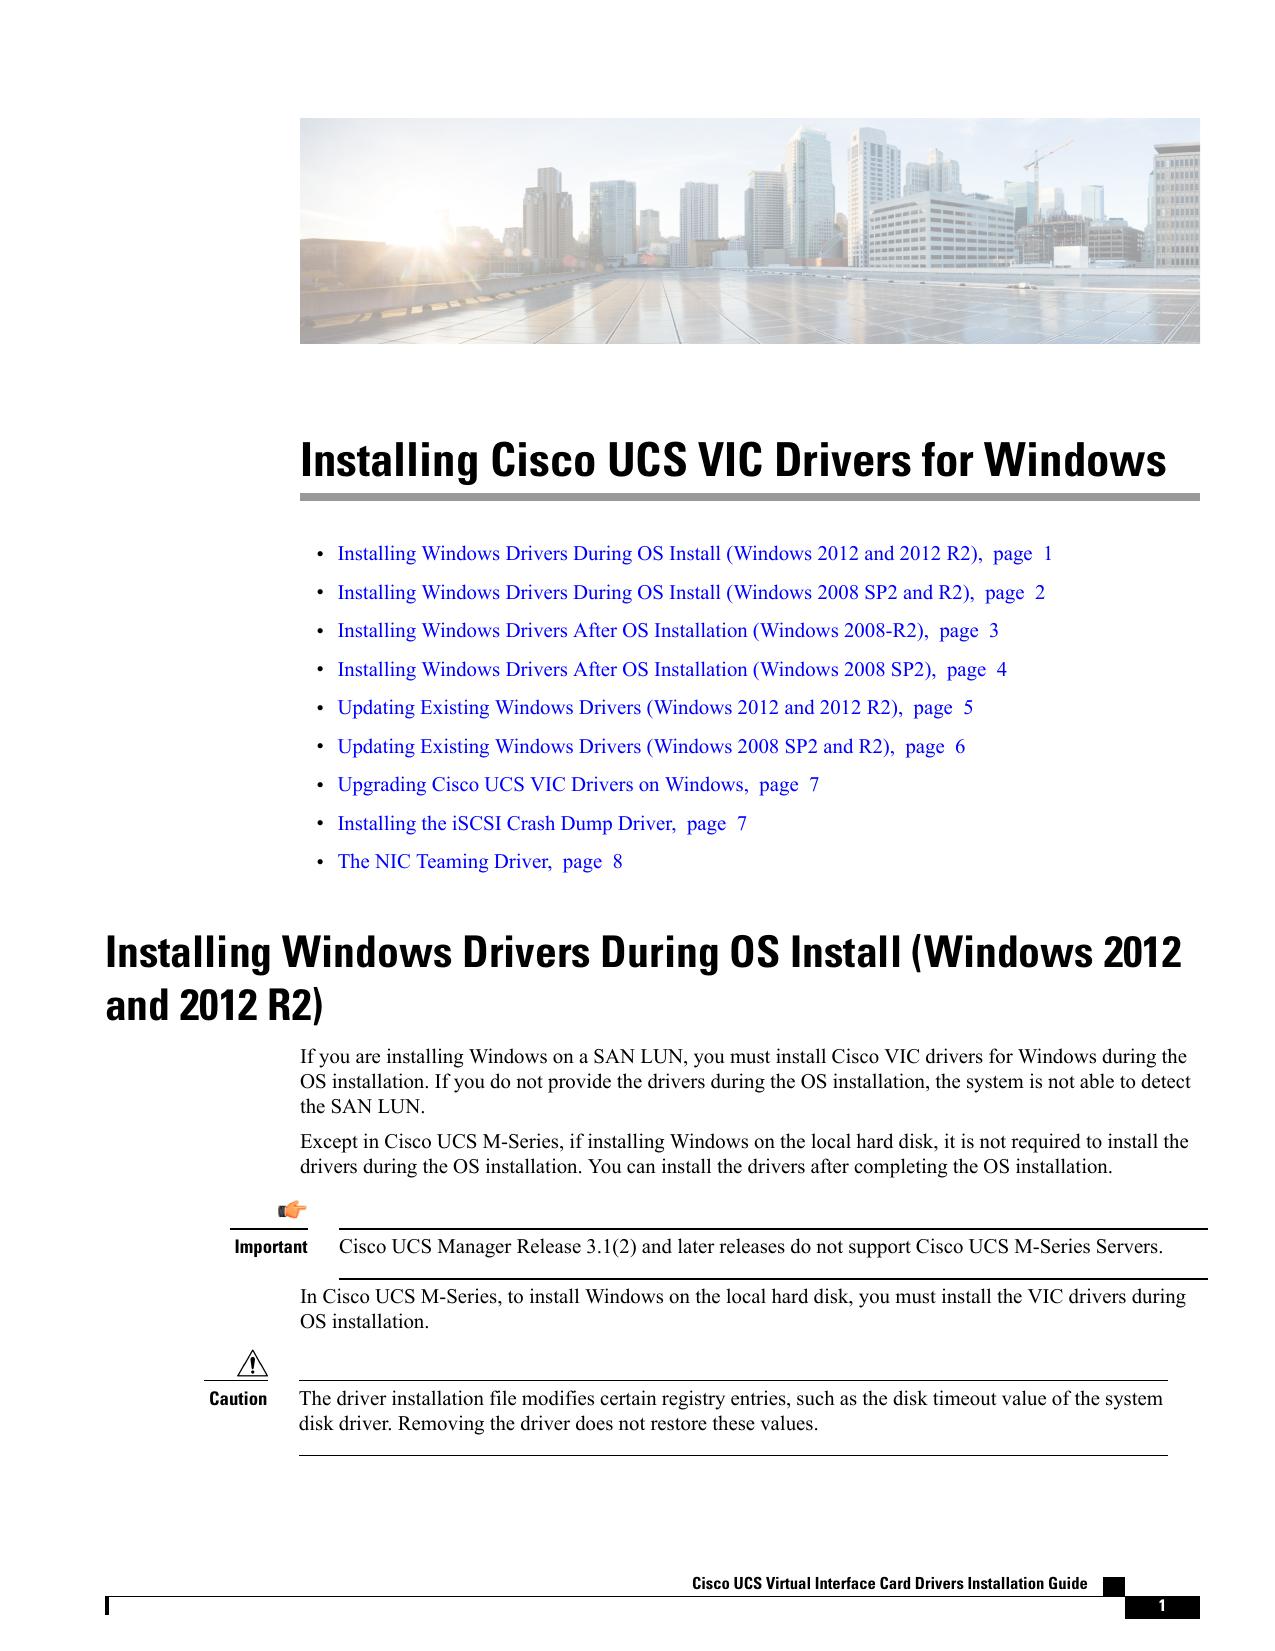 Installing Cisco UCS VIC Drivers for Windows | manualzz com